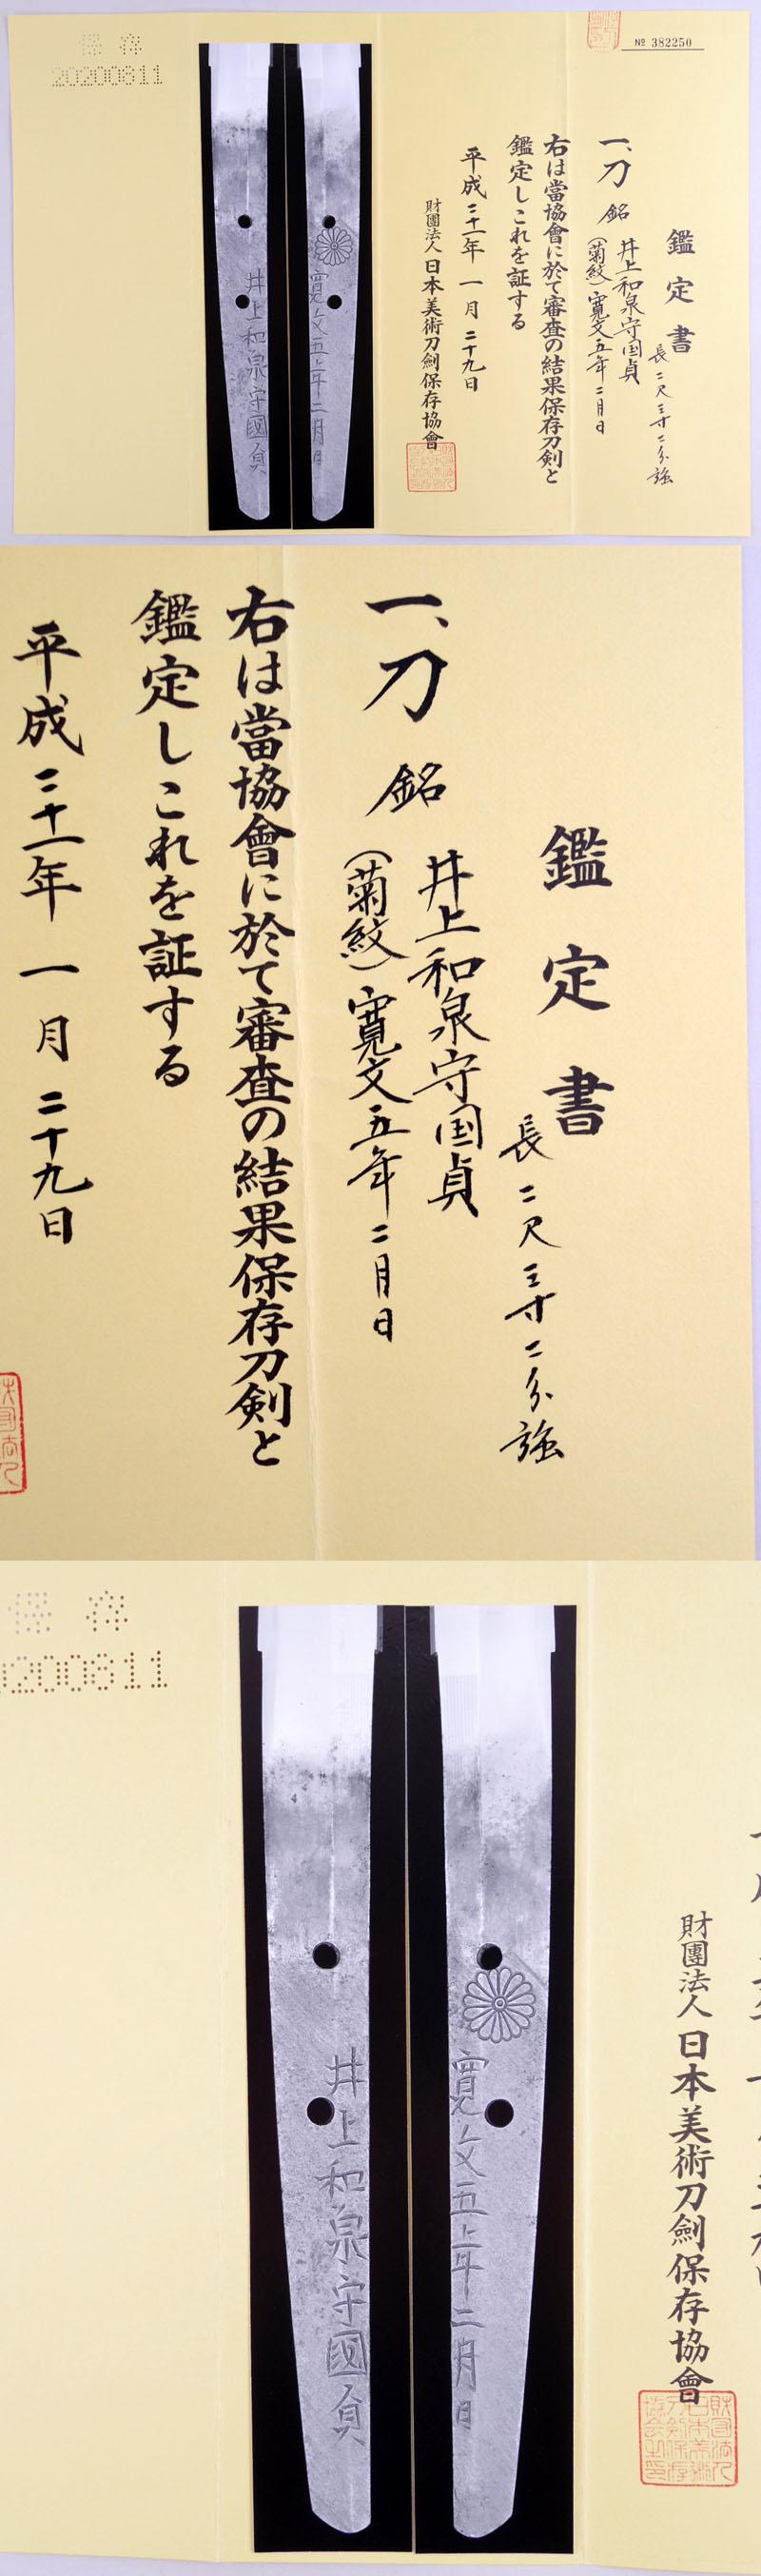 井上和泉守国貞(井上真改) Picture of Certificate